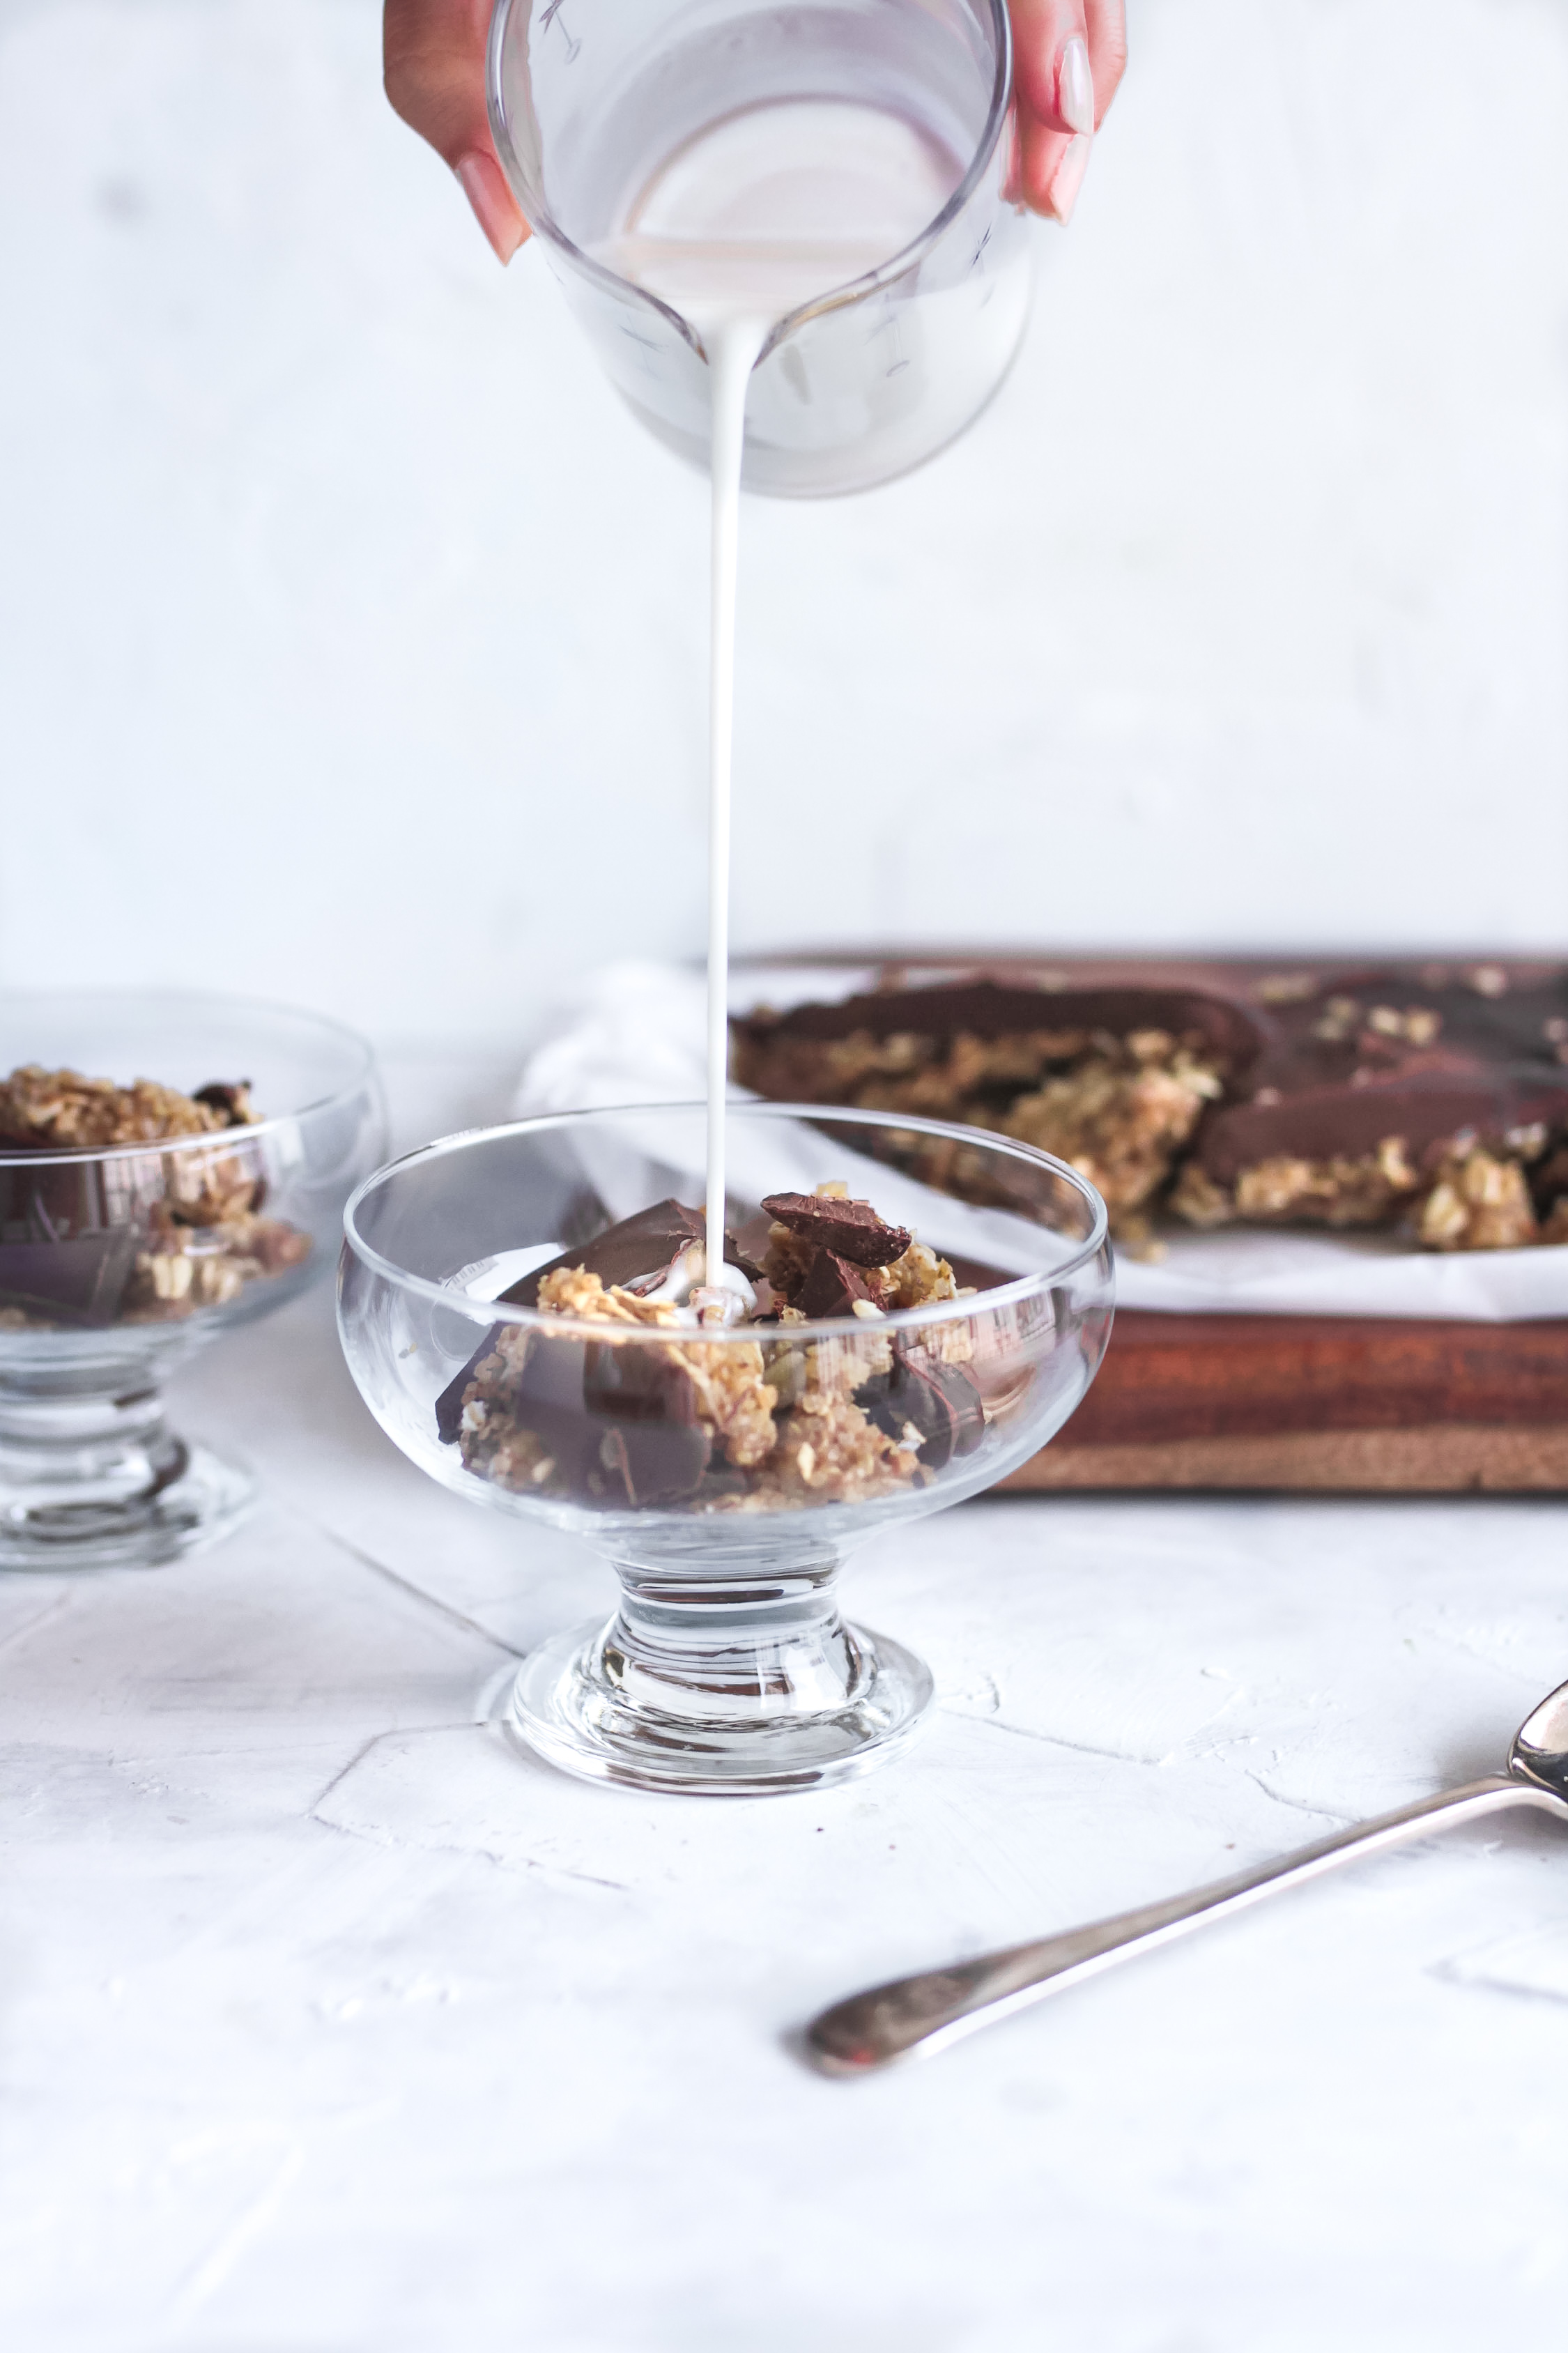 Honey Quinoa Oat Chocolate Cereal